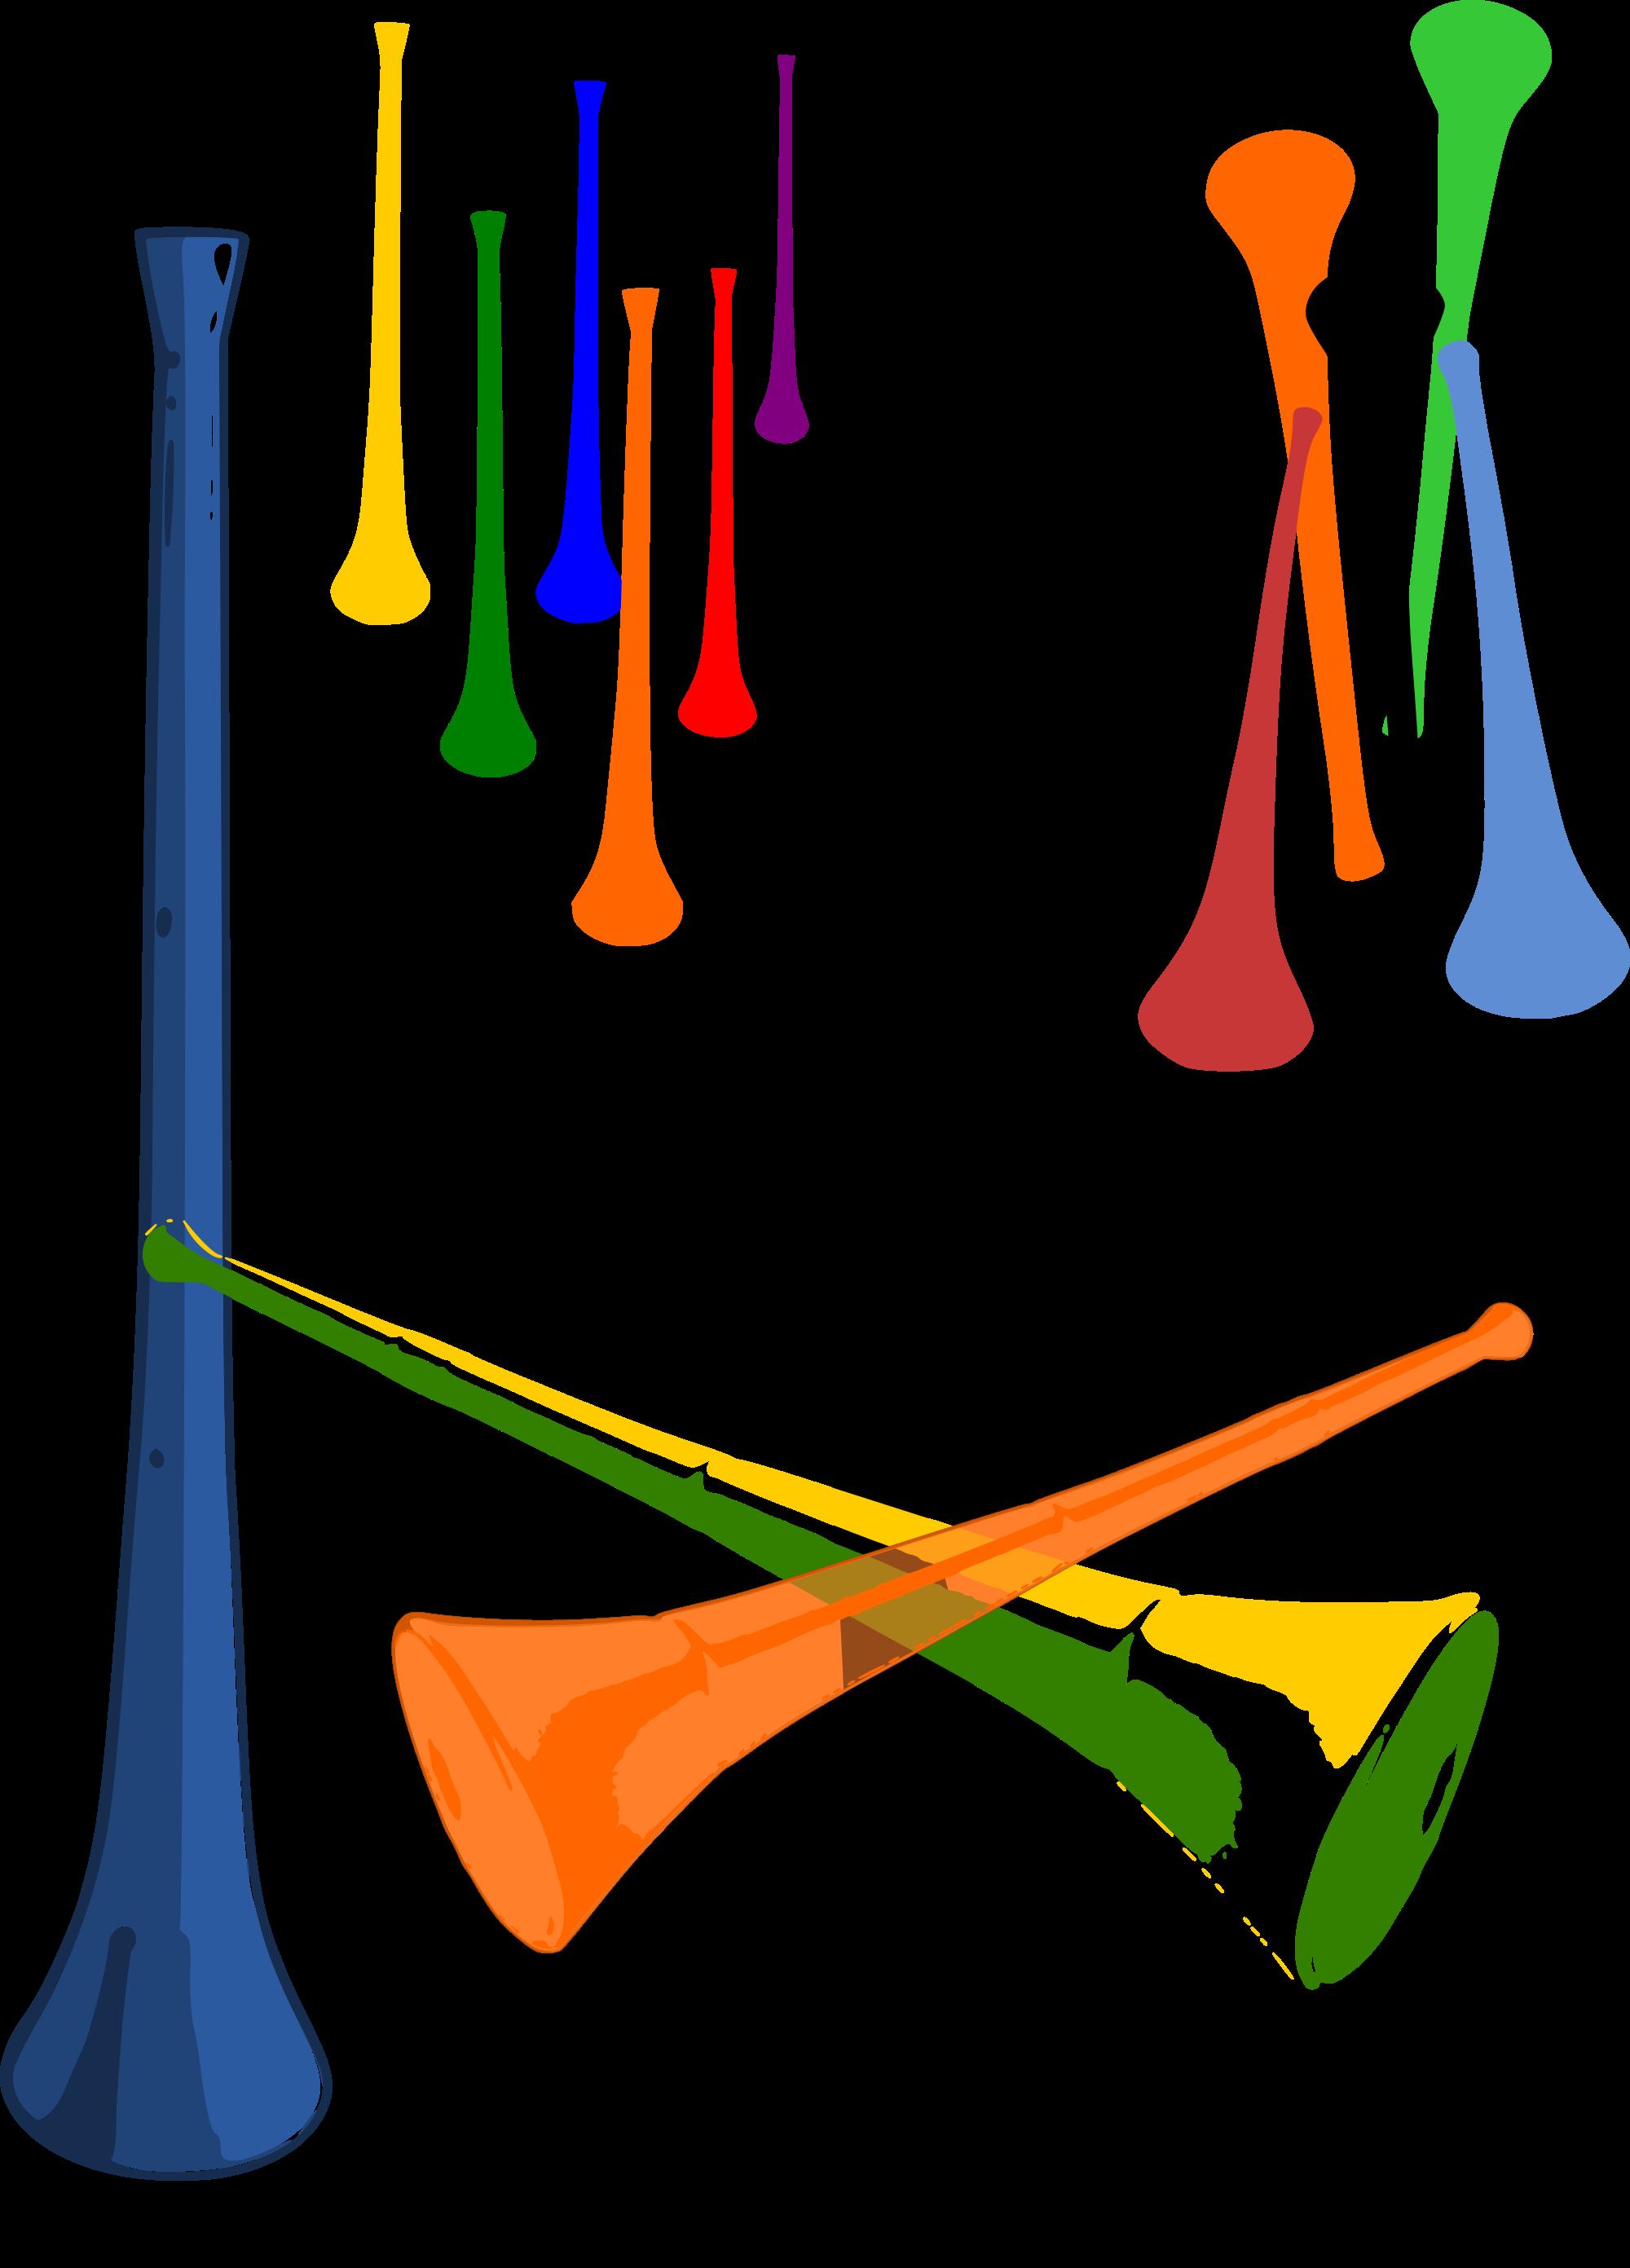 Car horn clipart graphic transparent File:Vuvuzelas.svg - Wikimedia Commons graphic transparent